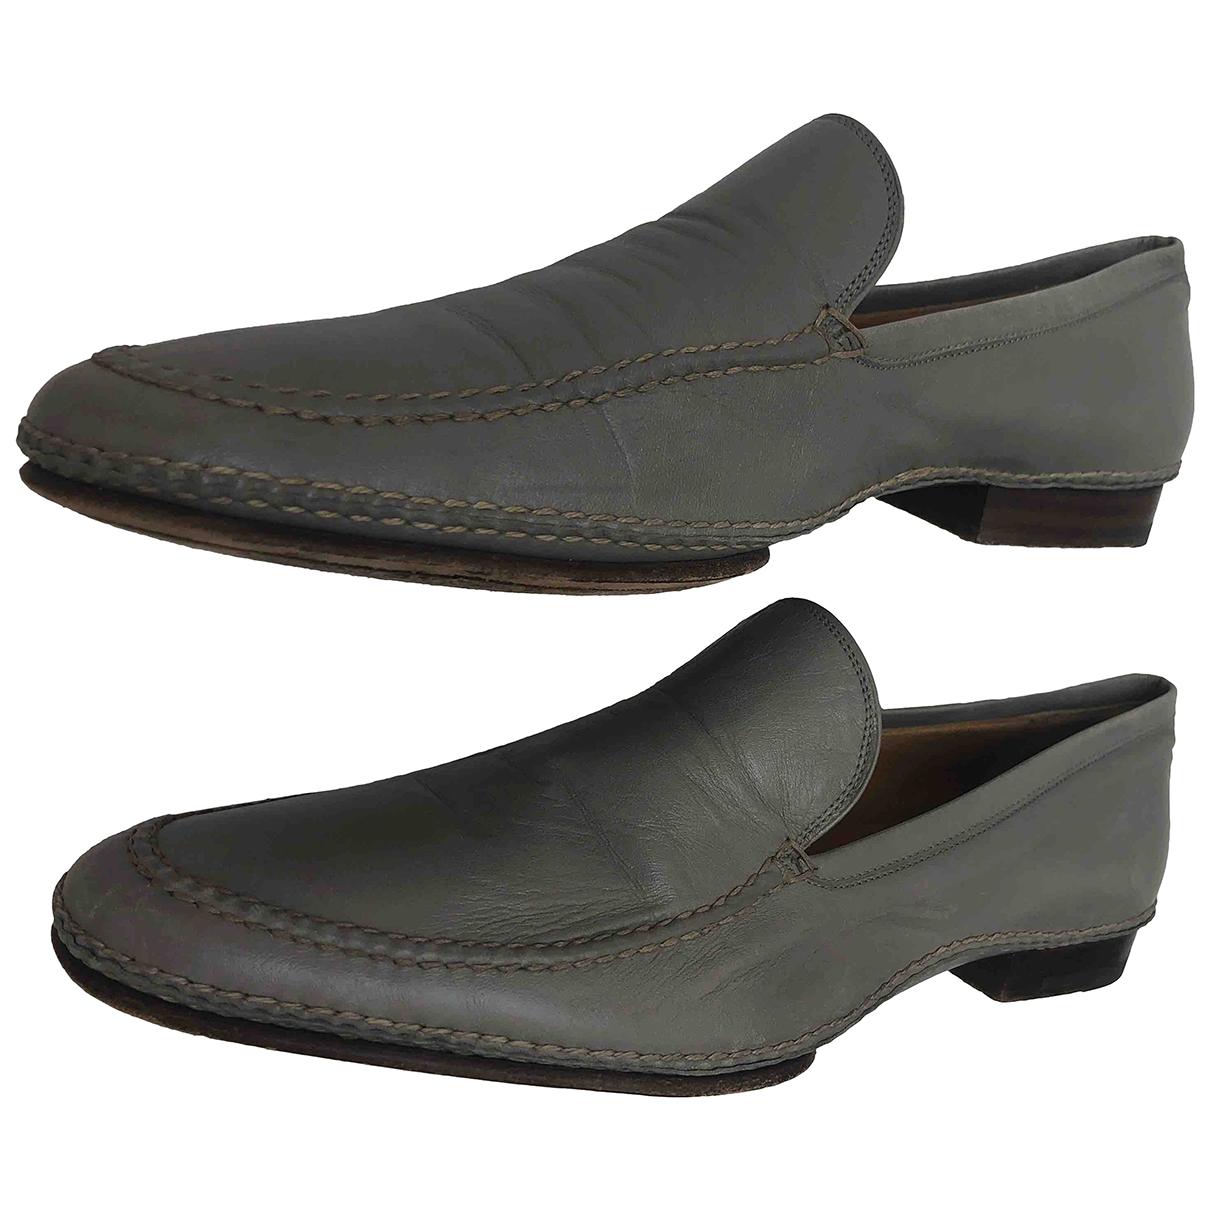 Hermès \N Grey Leather Flats for Women 41.5 EU